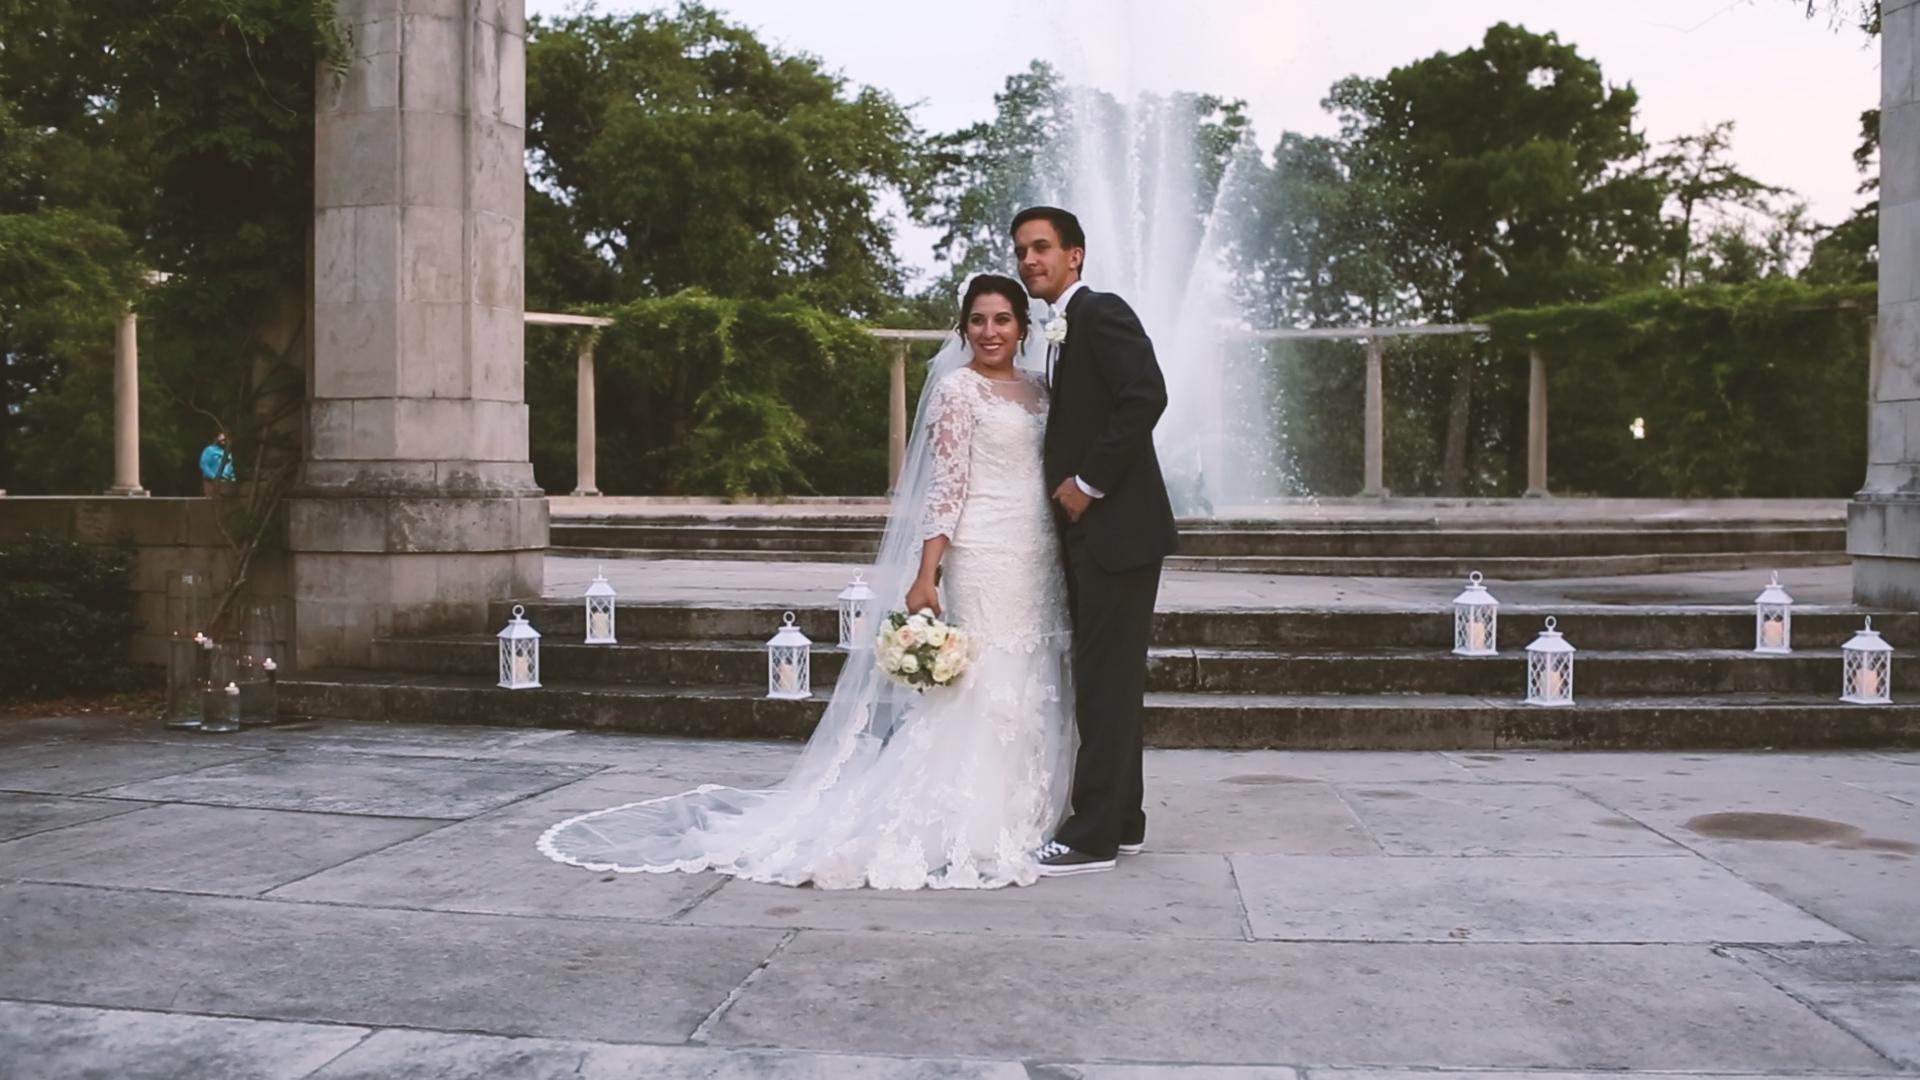 Popps Fountain - Bride Film